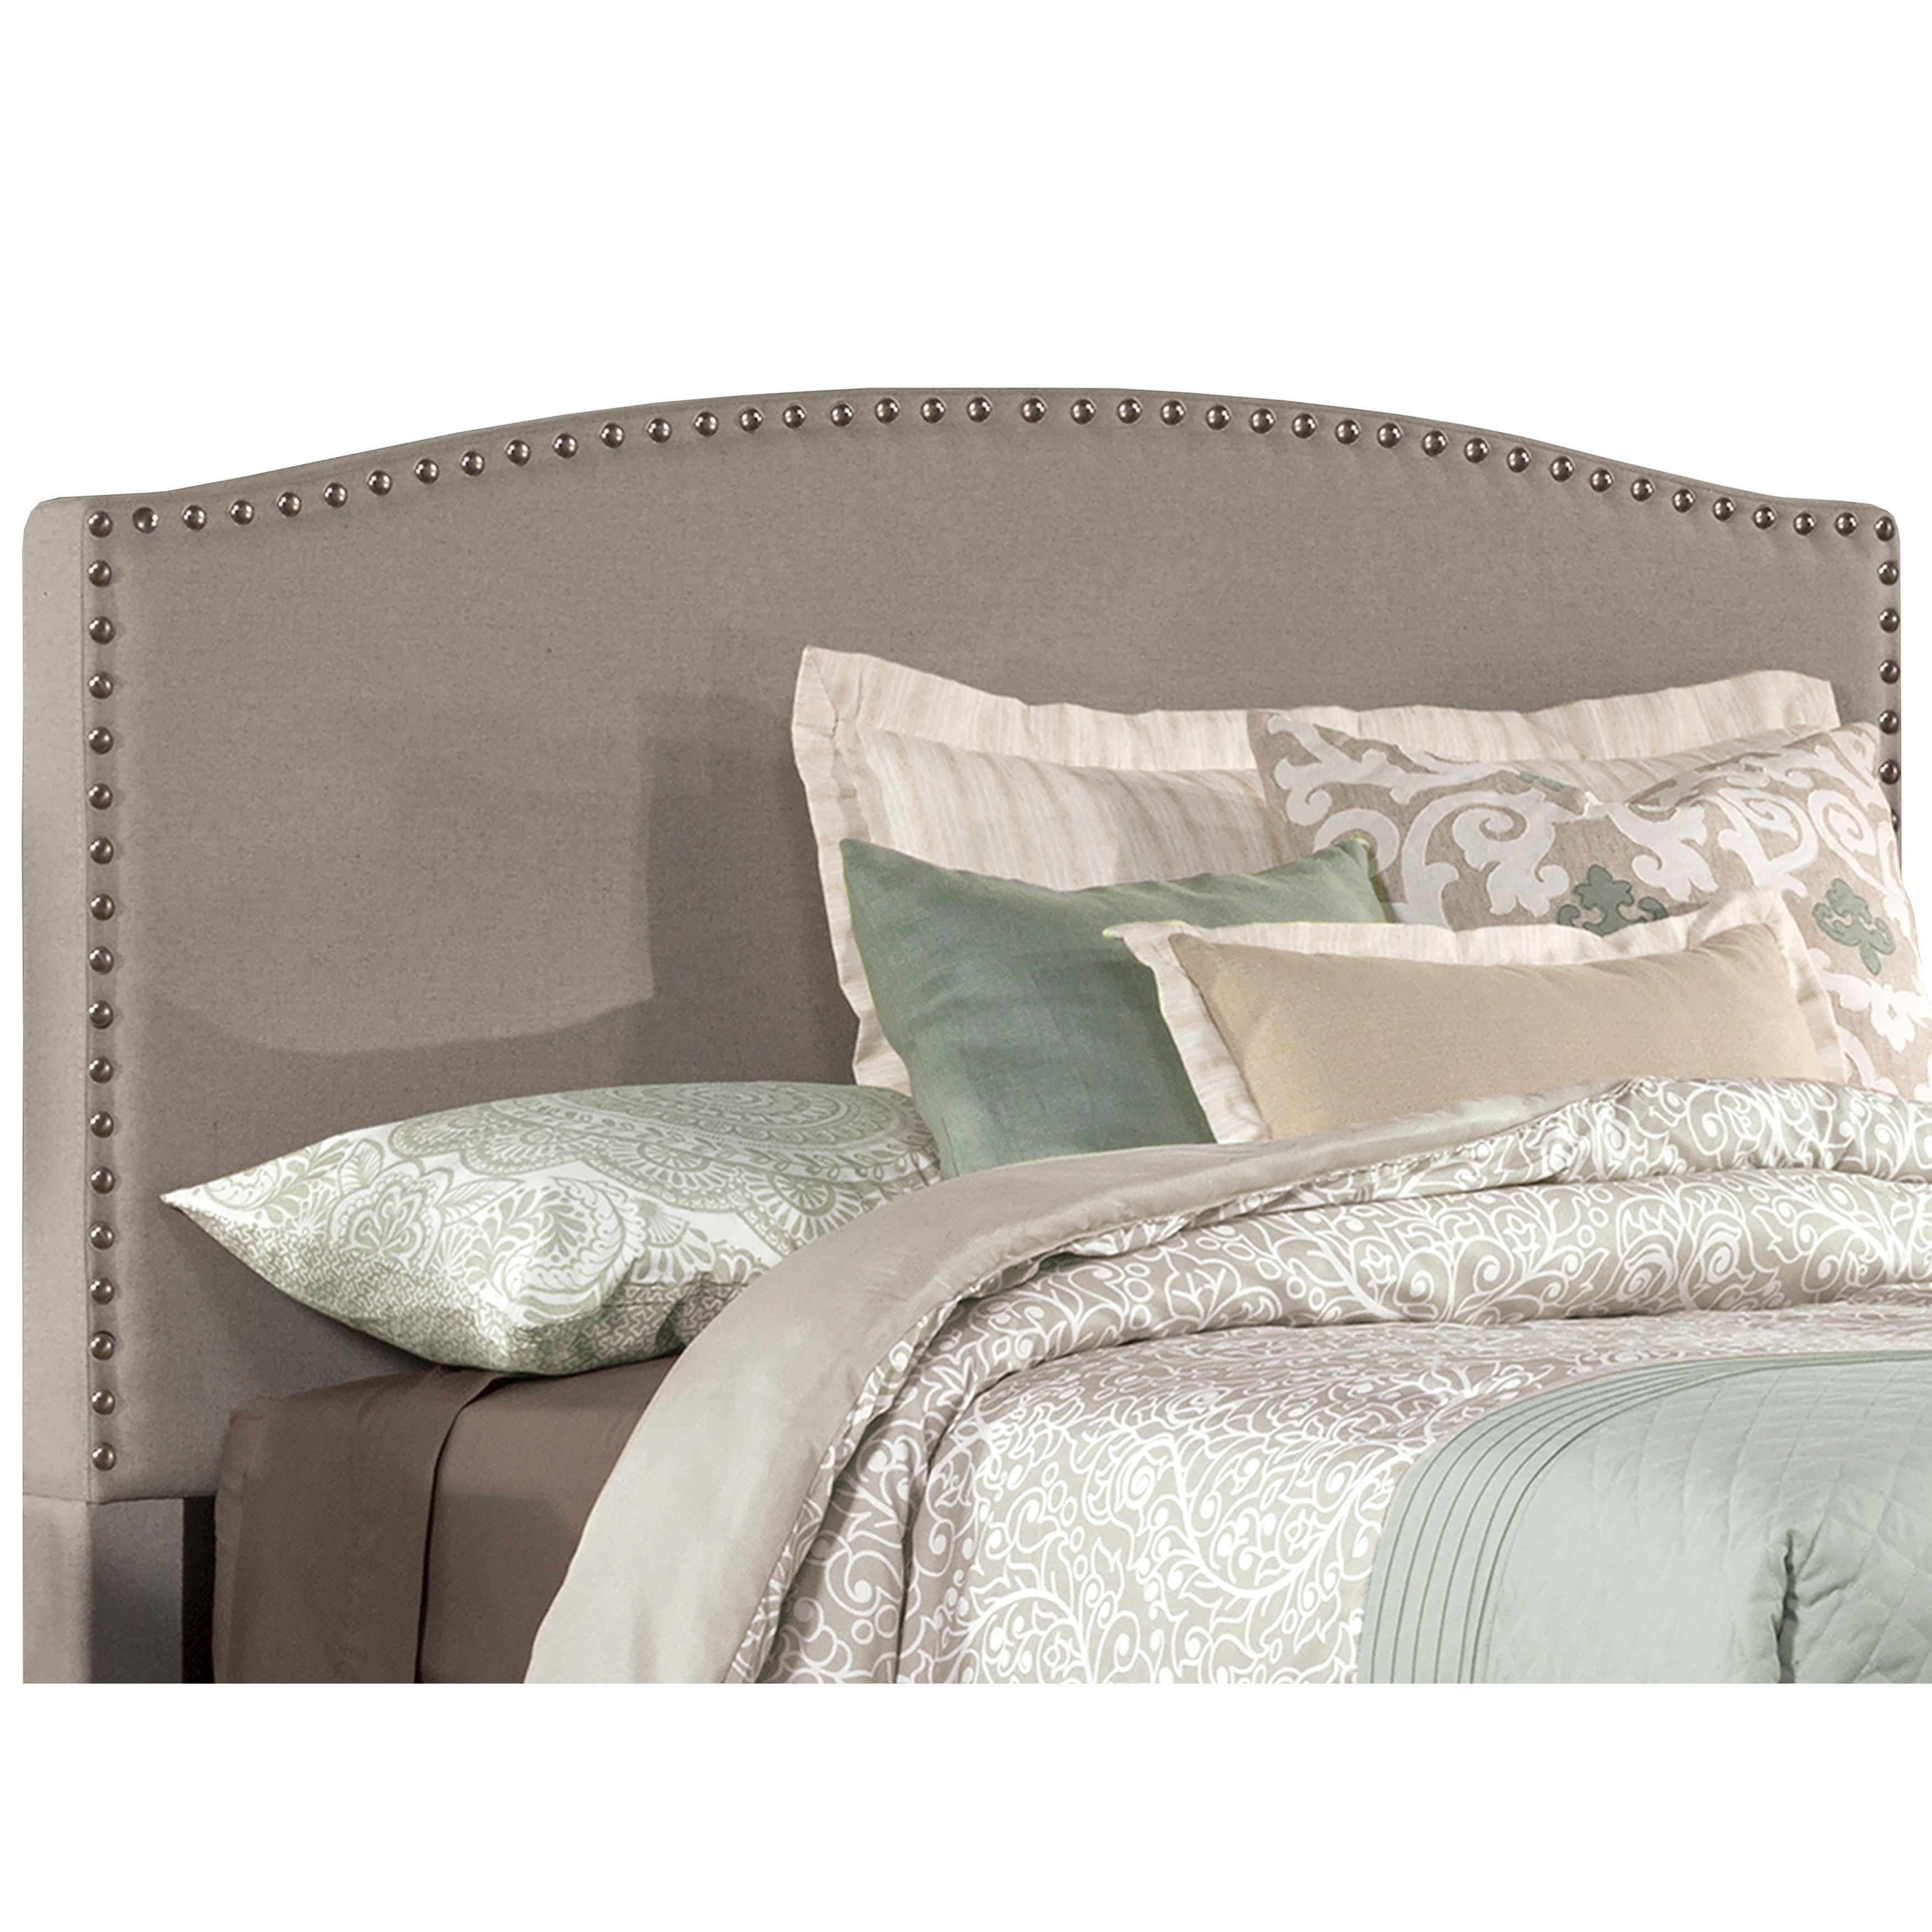 Shop Hillsdale Furniture Kerstien Dove Grey Fabric Headboard With Frame